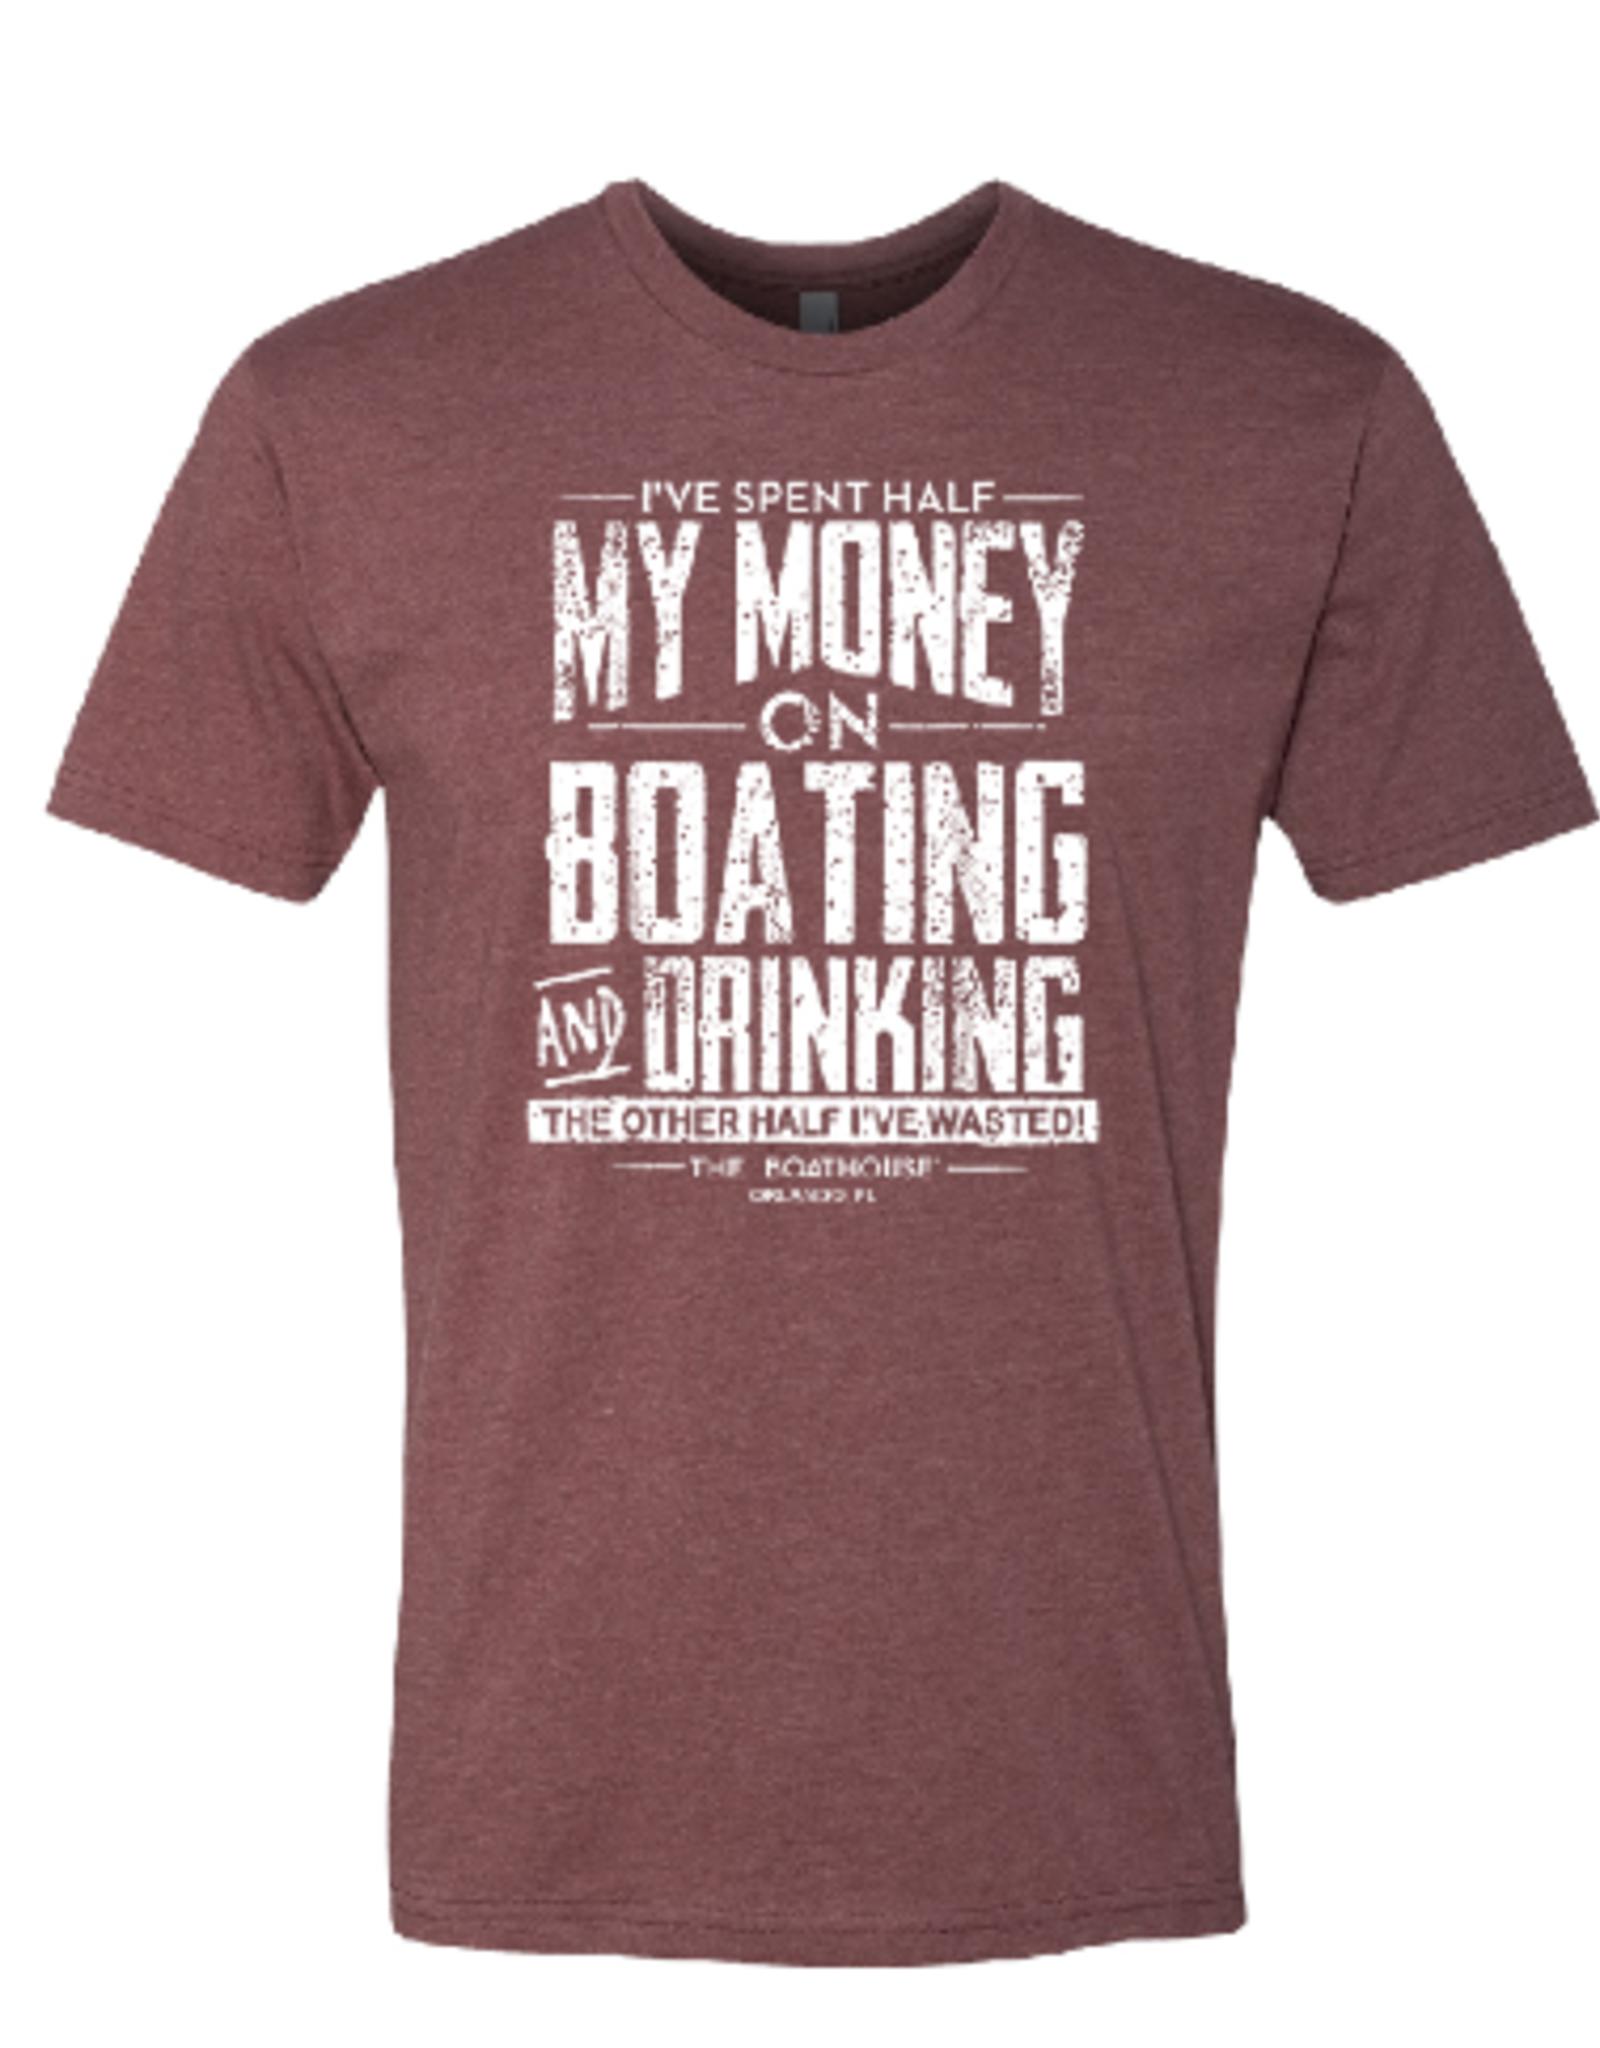 BH SPENT MY MONEY